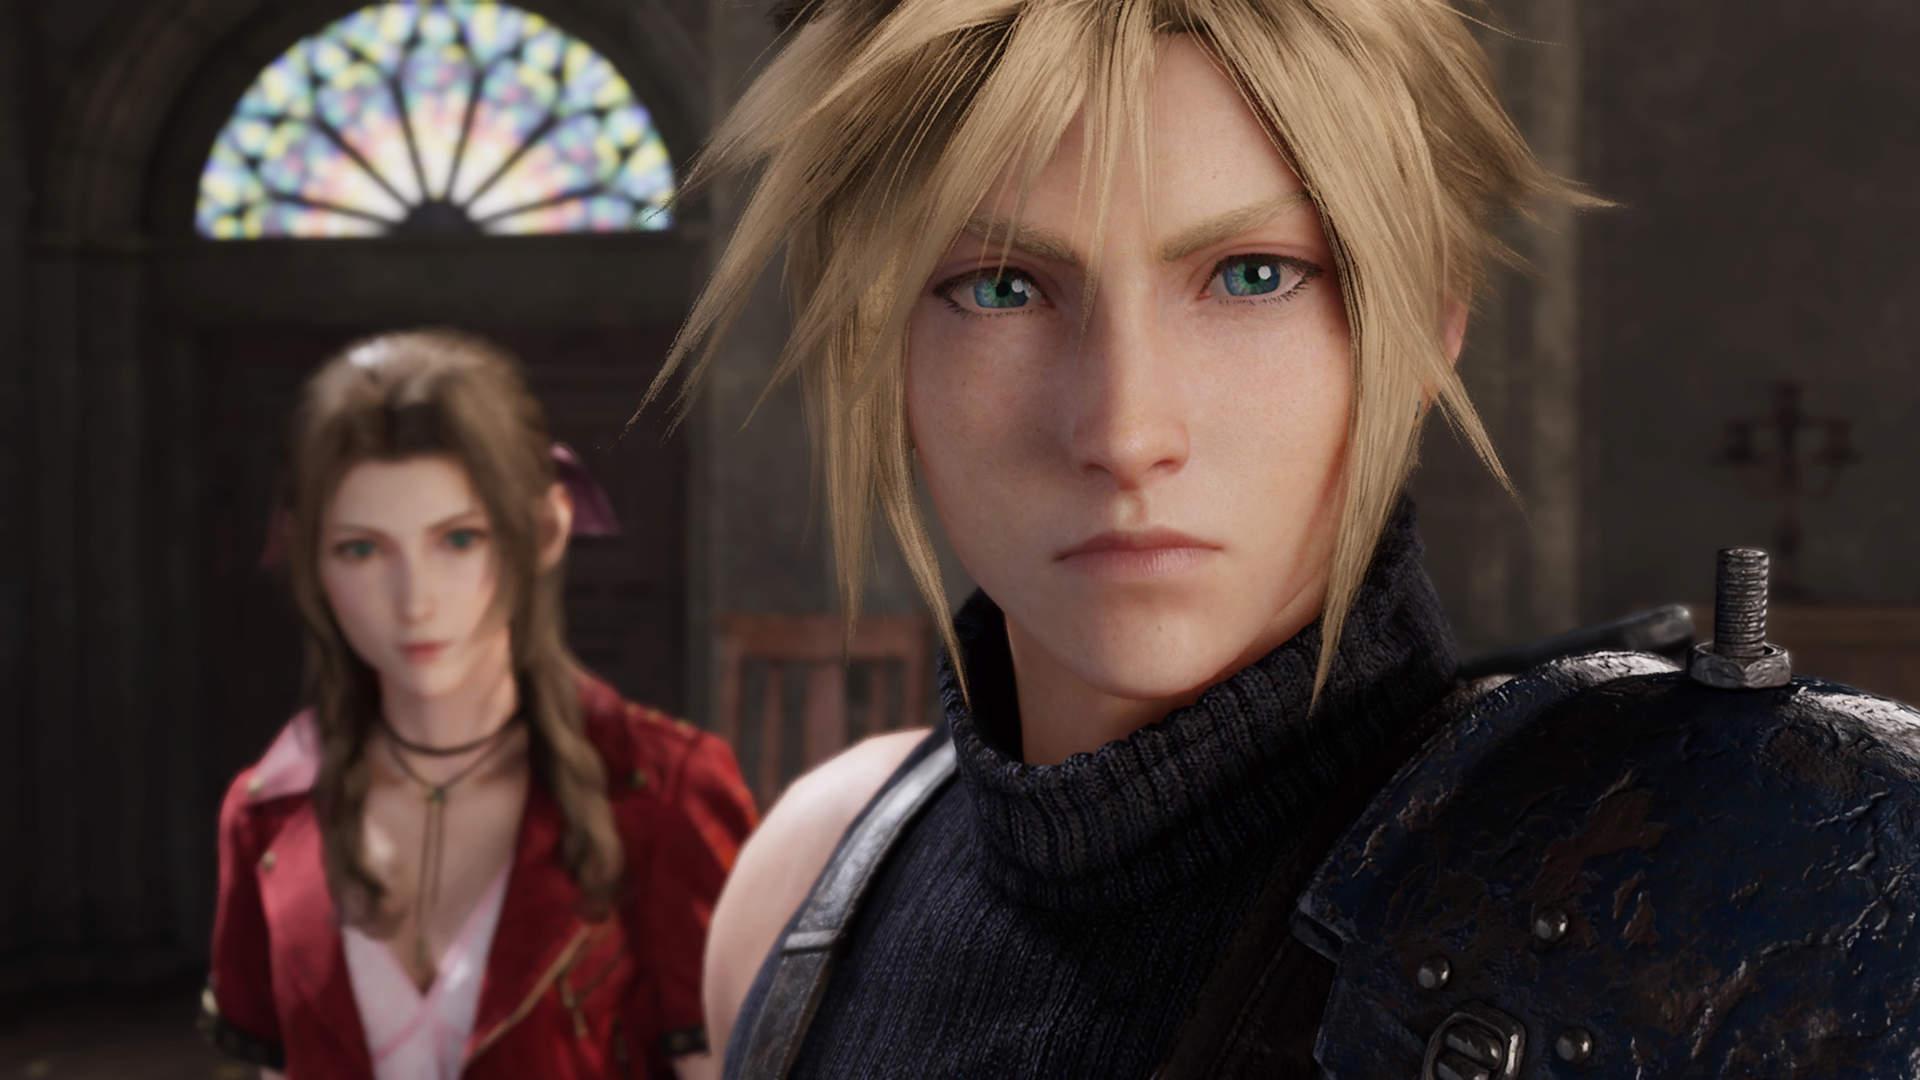 Final Fantasy 7 Remake 2342020 1